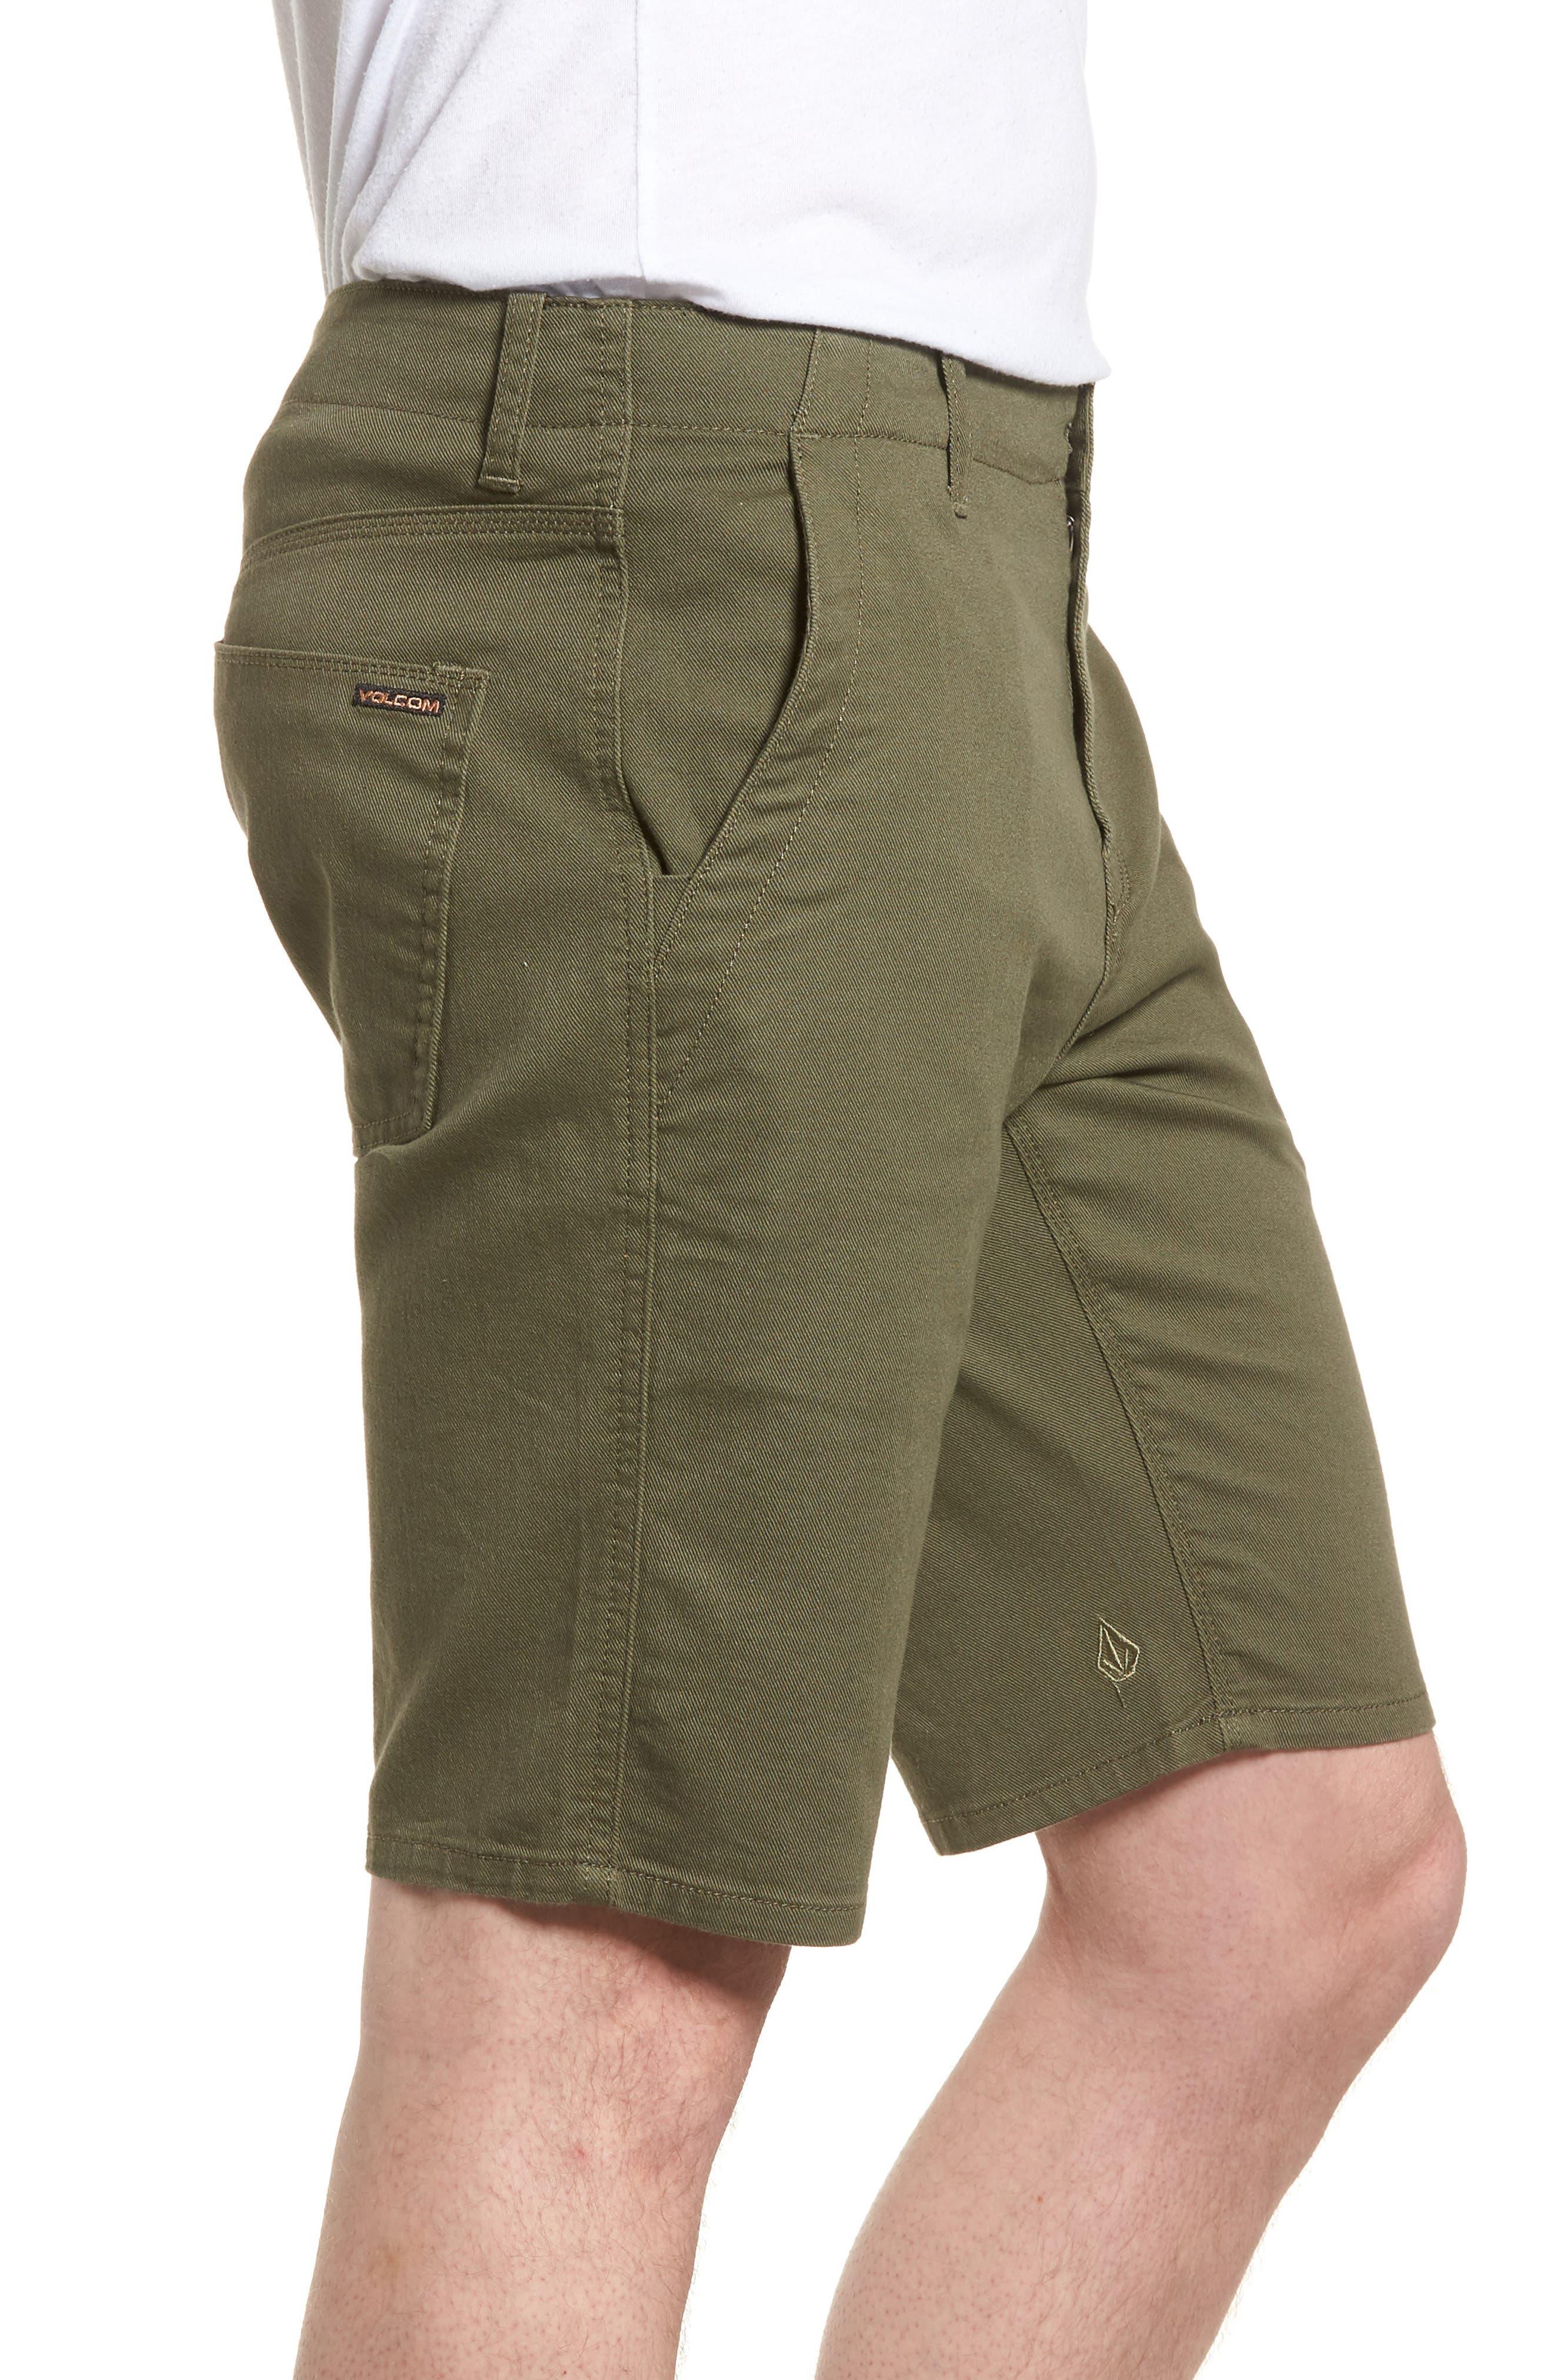 VSM Prowler Shorts,                             Alternate thumbnail 3, color,                             Military